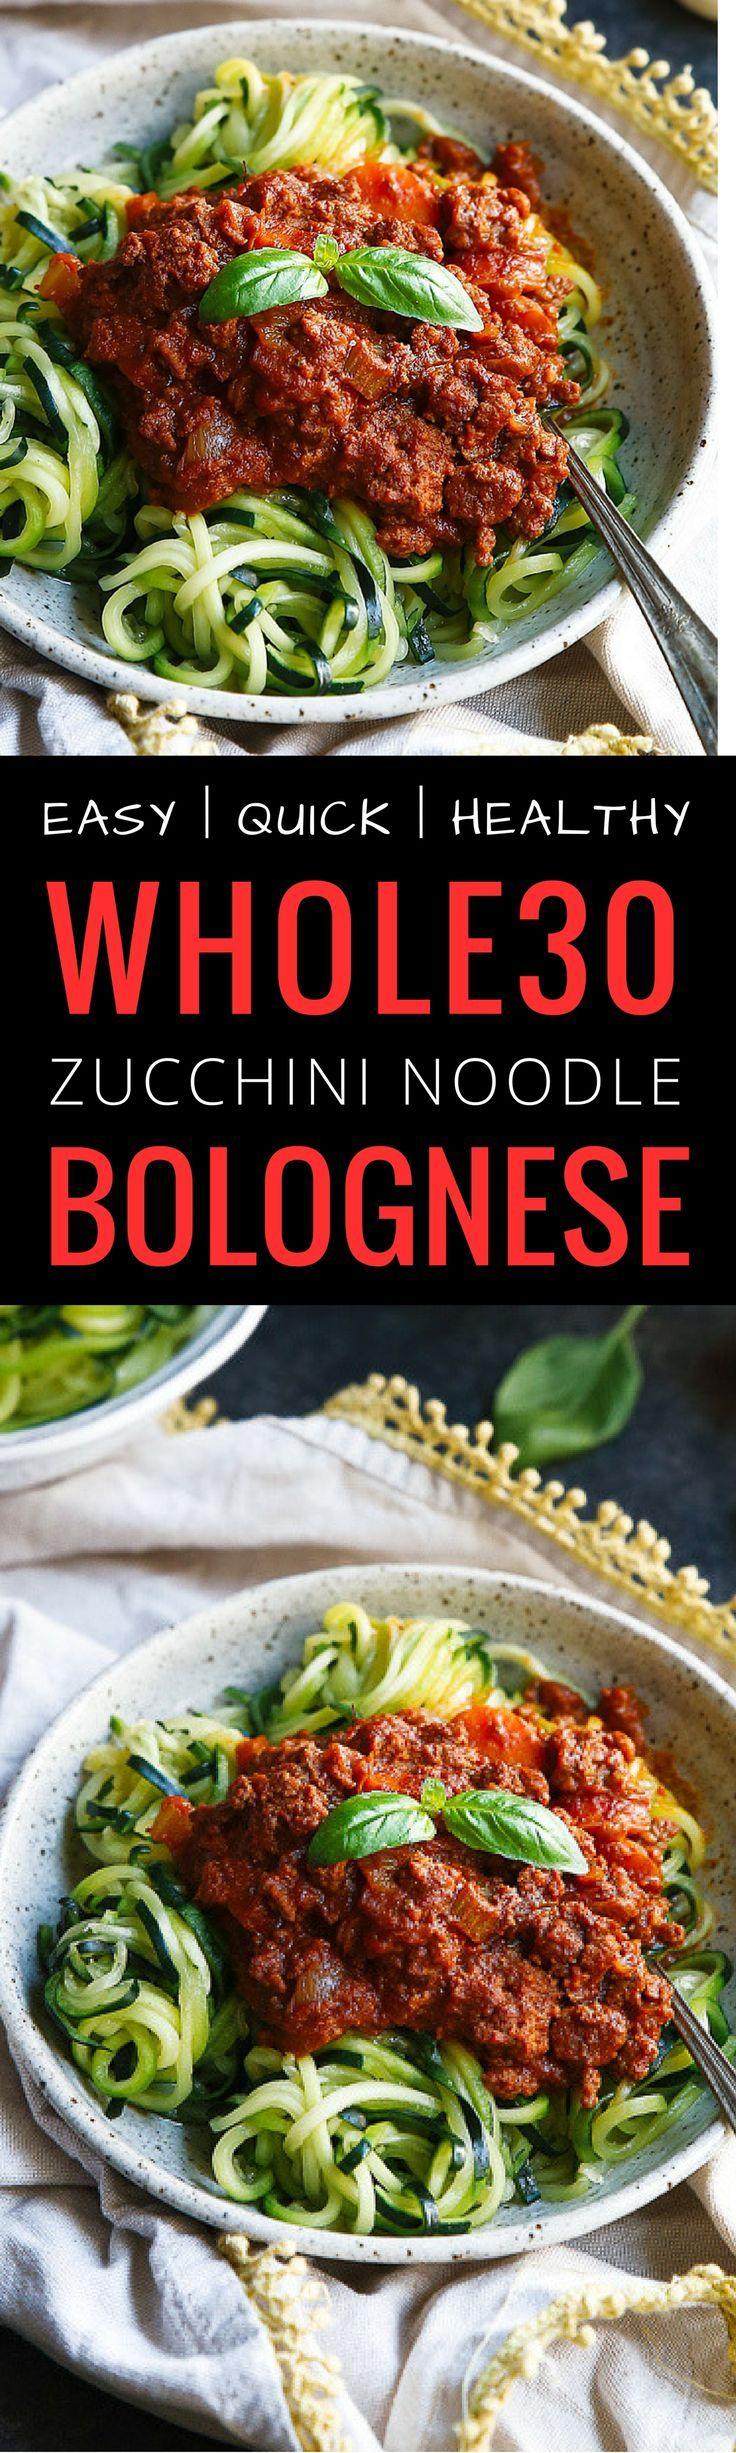 Whole30 Zucchini Noodle Bolognese. Paleo bolognese…